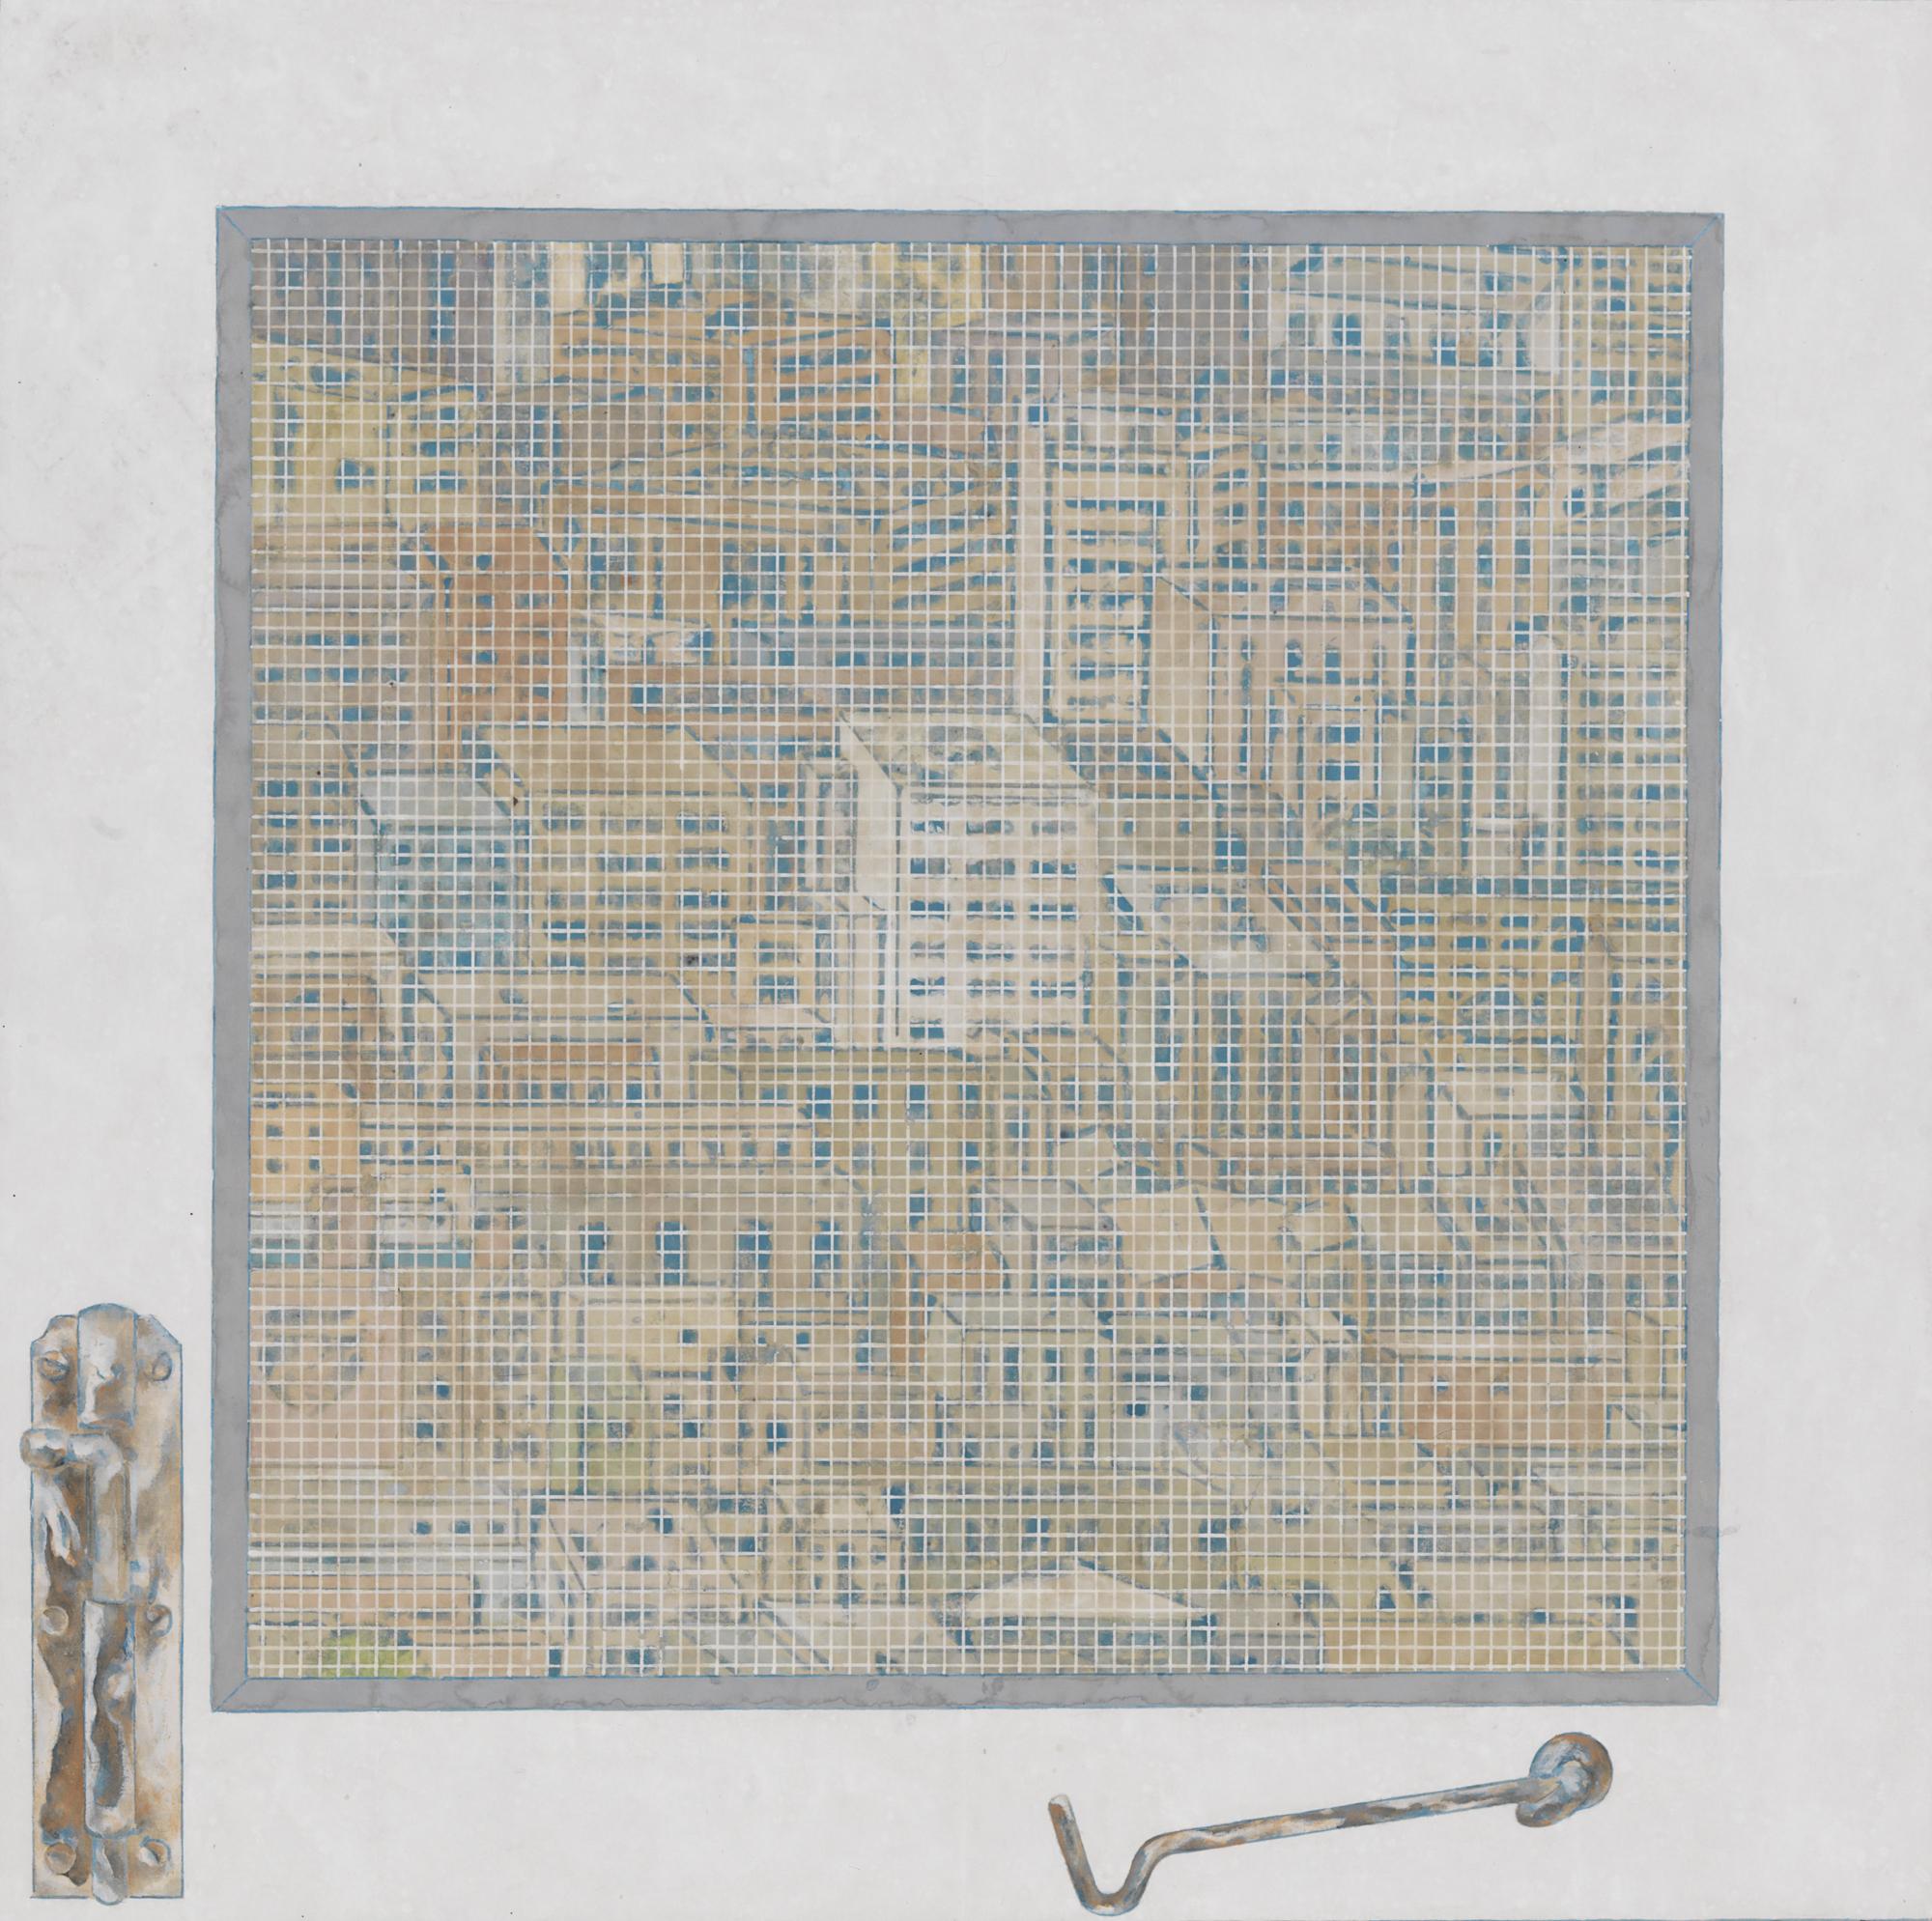 Peng Jian 彭剑, White Window 白窗, 2011, Color on paper 纸本设色, 51 x 51 cm